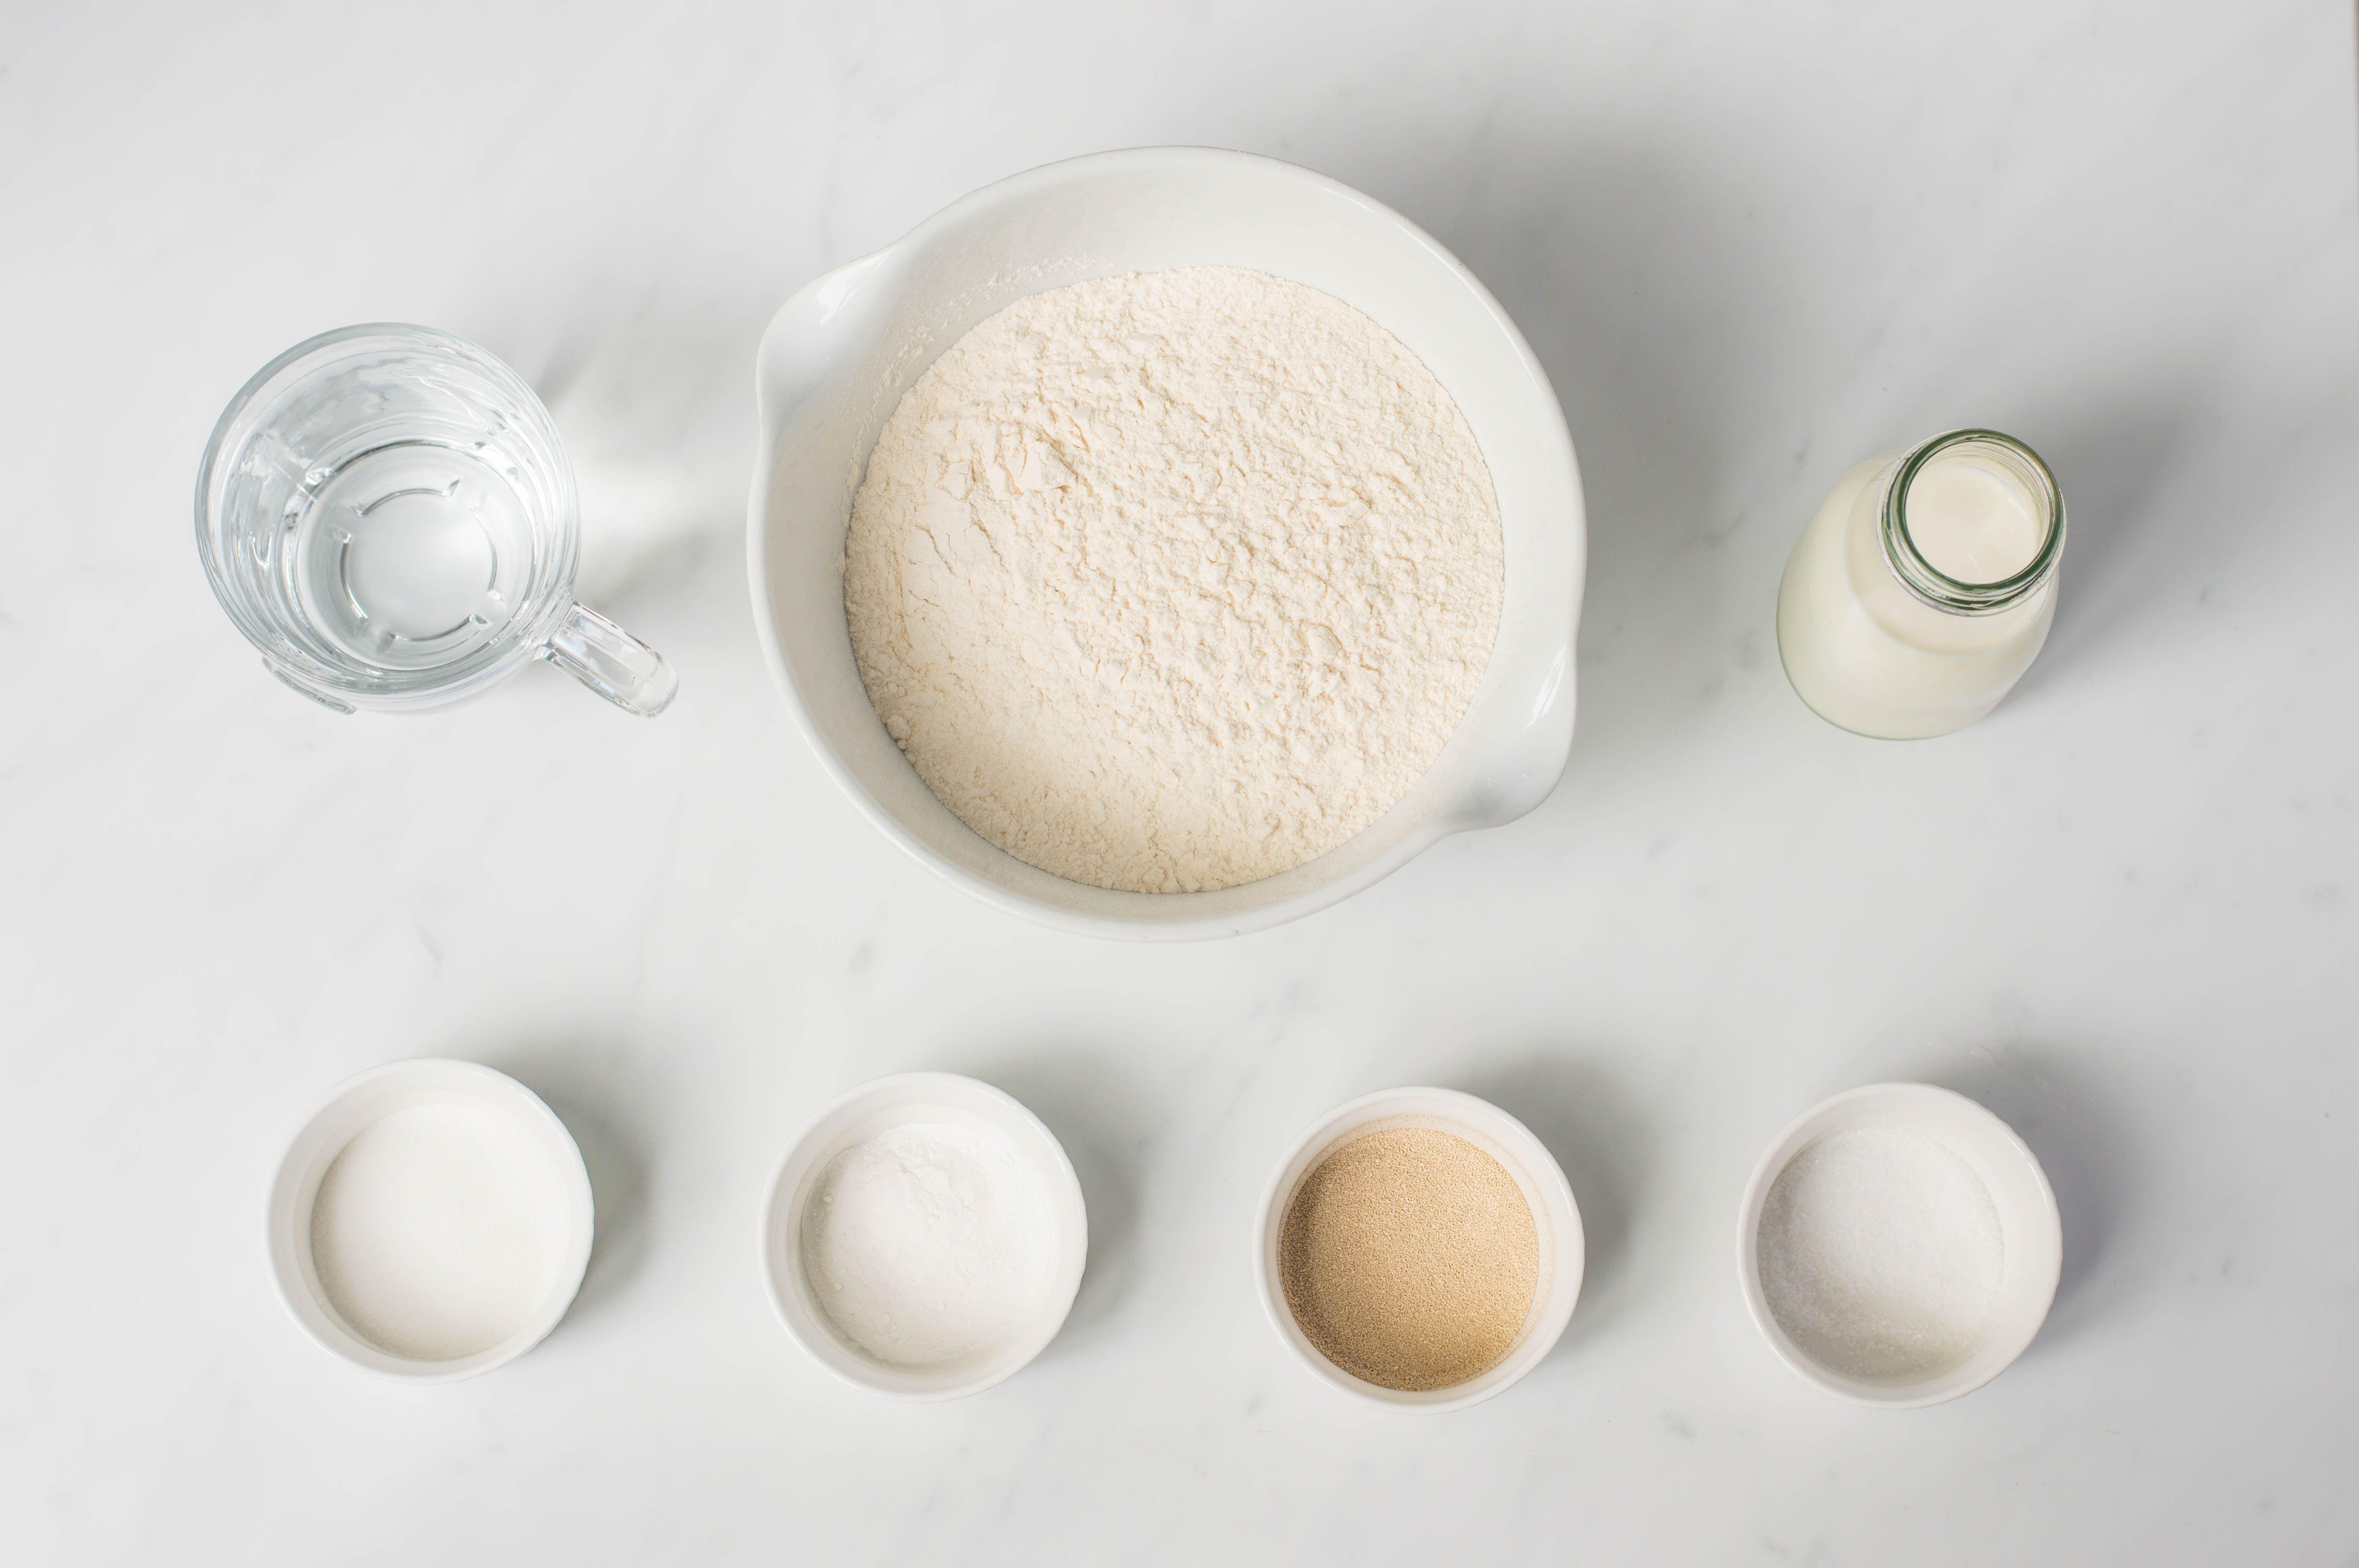 Traditional English crumpets recipe ingredients